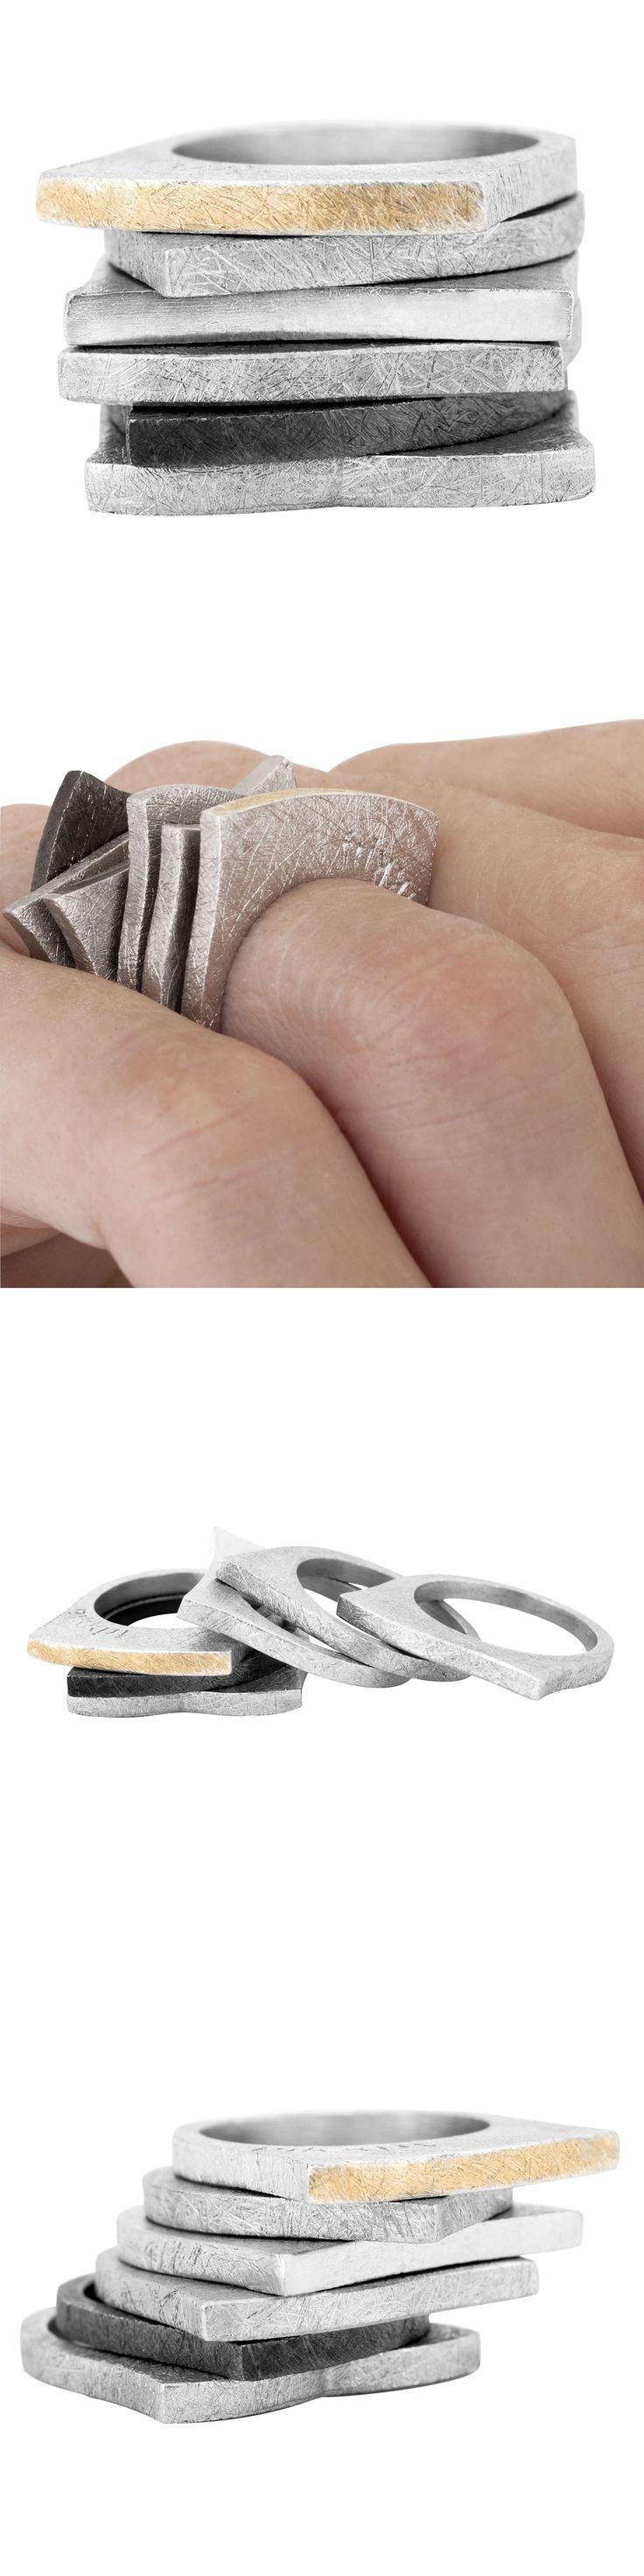 Rings by Frikkia - silver/gold - anillos de plata y oro